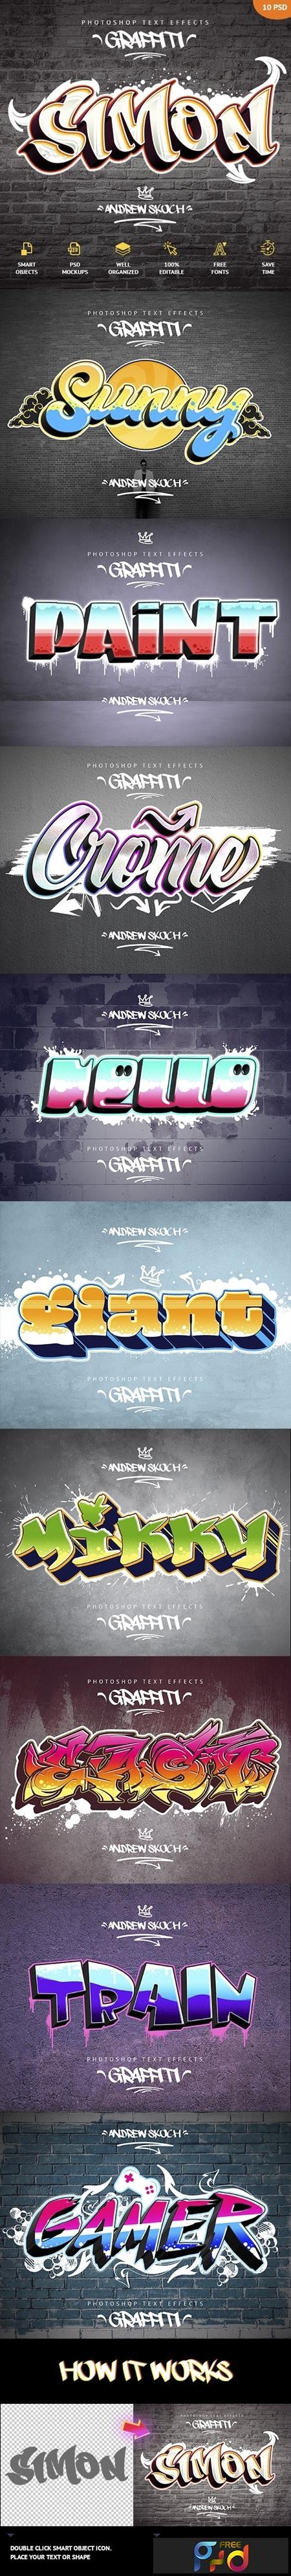 Graffiti Text Effects - 10 PSD 23797200 1